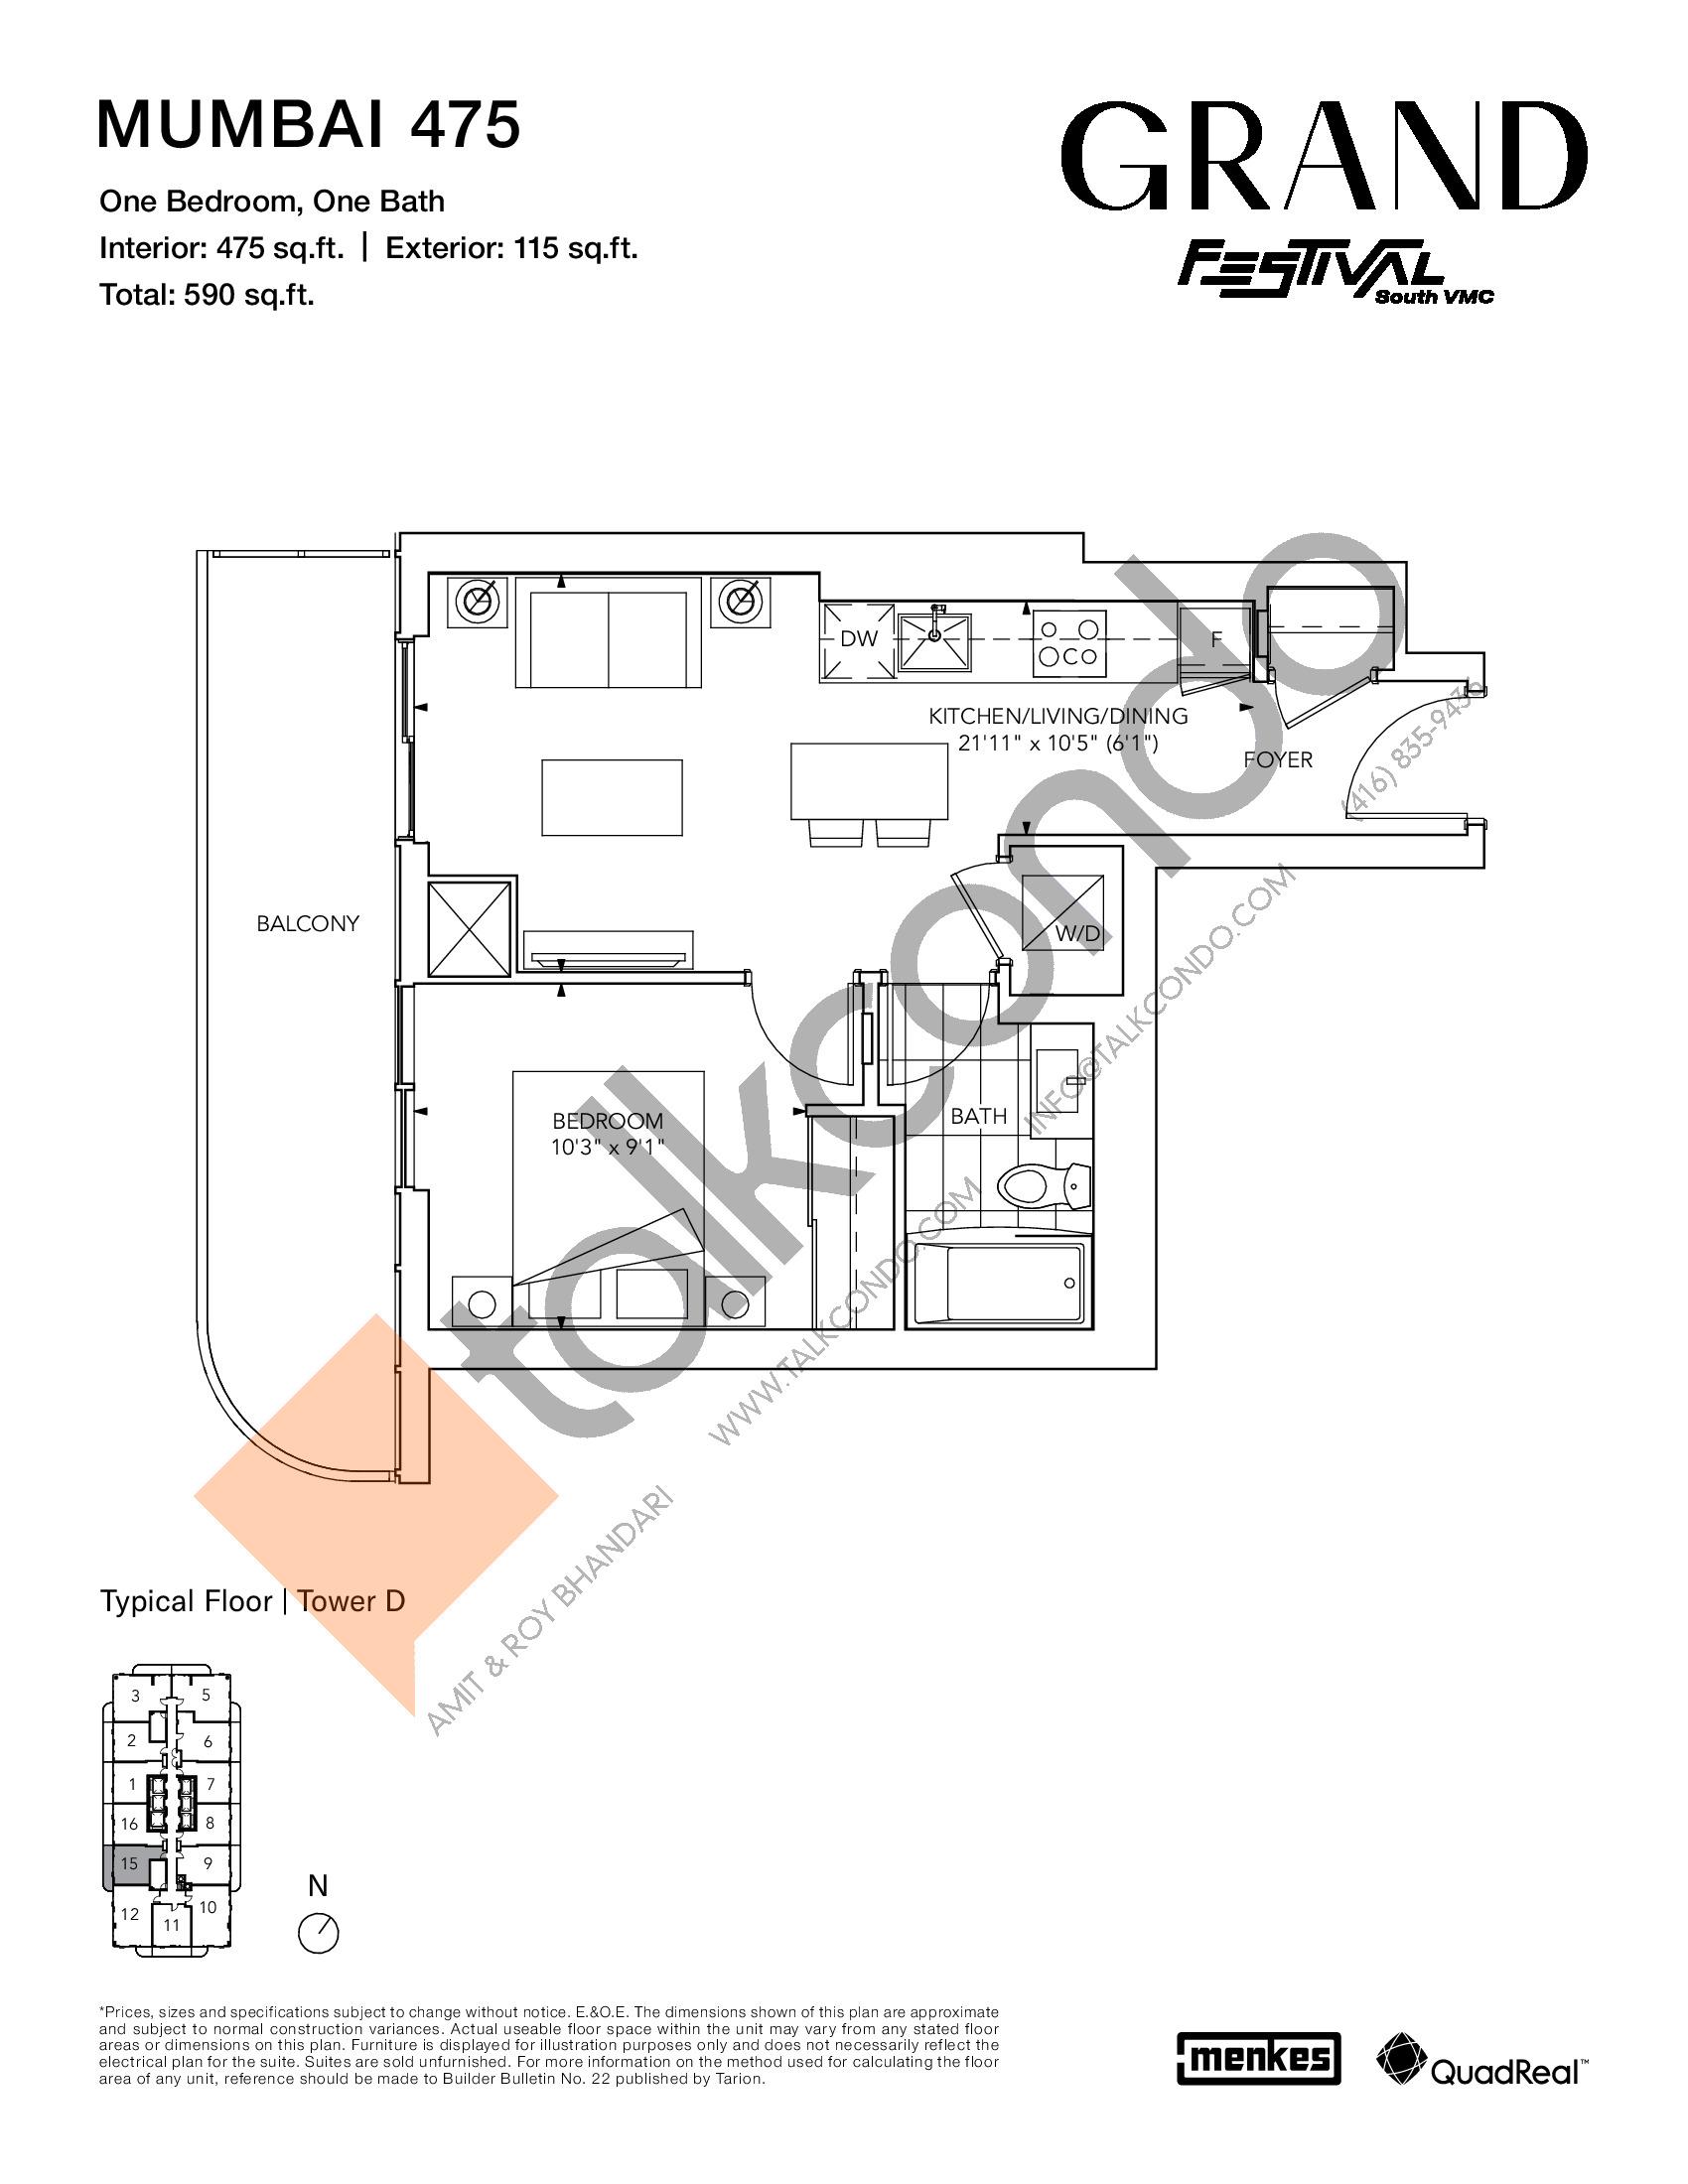 Mumbai 475 Floor Plan at Grand Festival Condos - 475 sq.ft